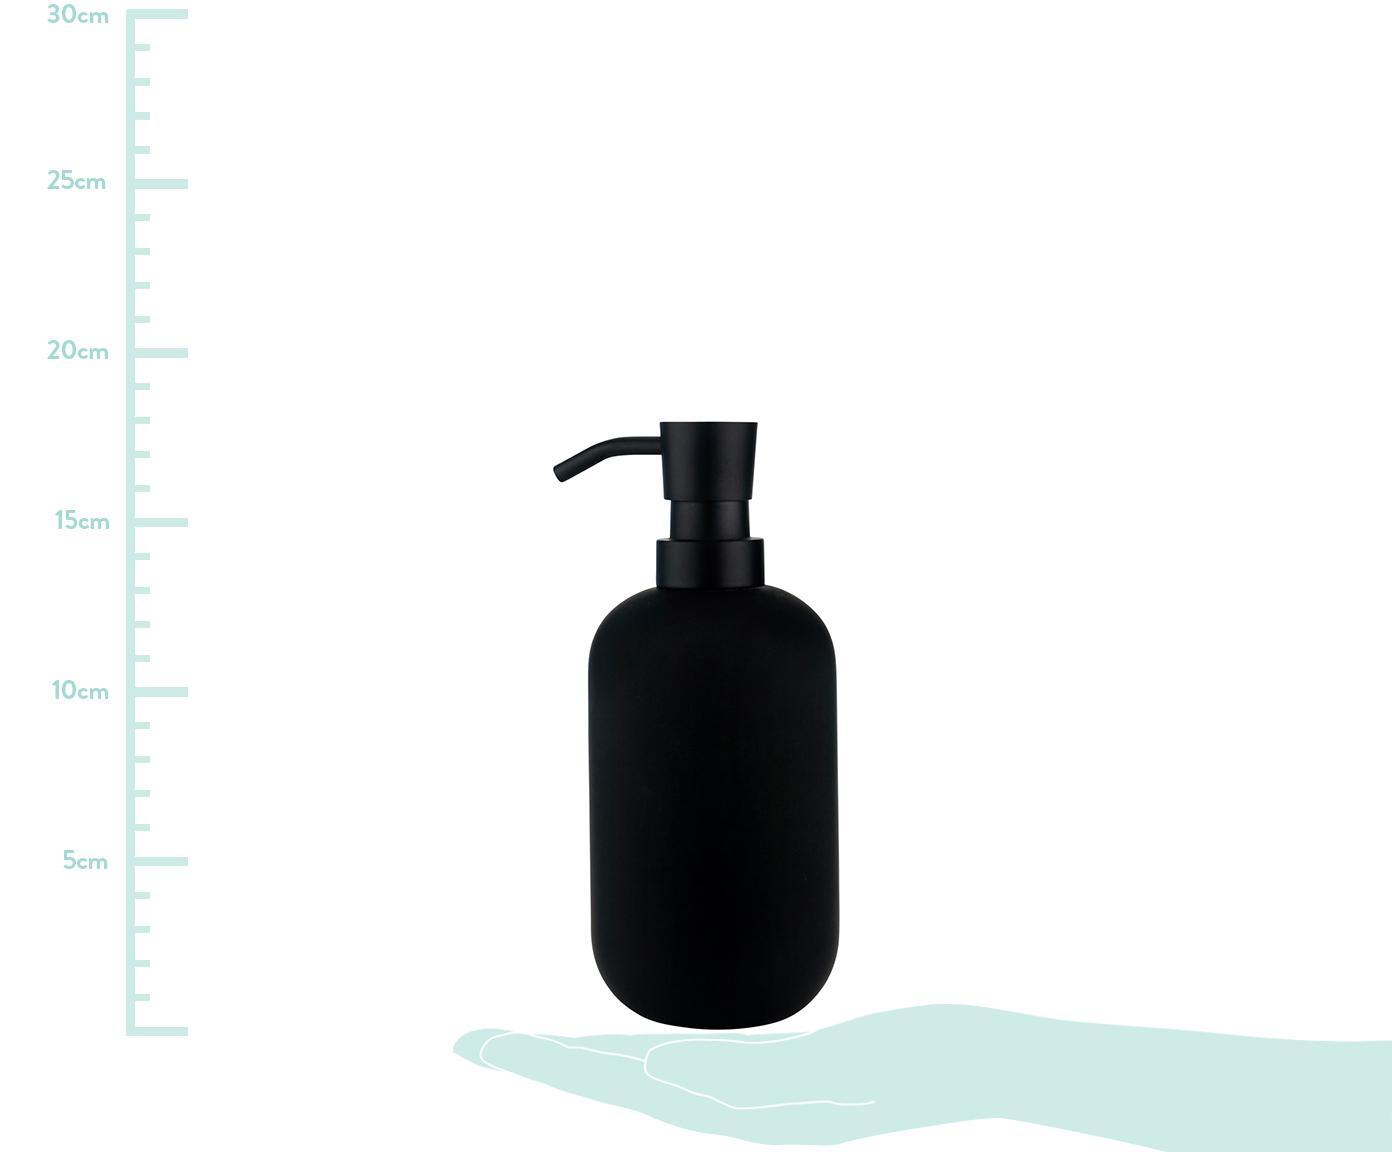 Keramik-Seifenspender Lotus, Behälter: Keramik, Pumpkopf: Metall, Schwarz, Ø 8 x H 18 cm